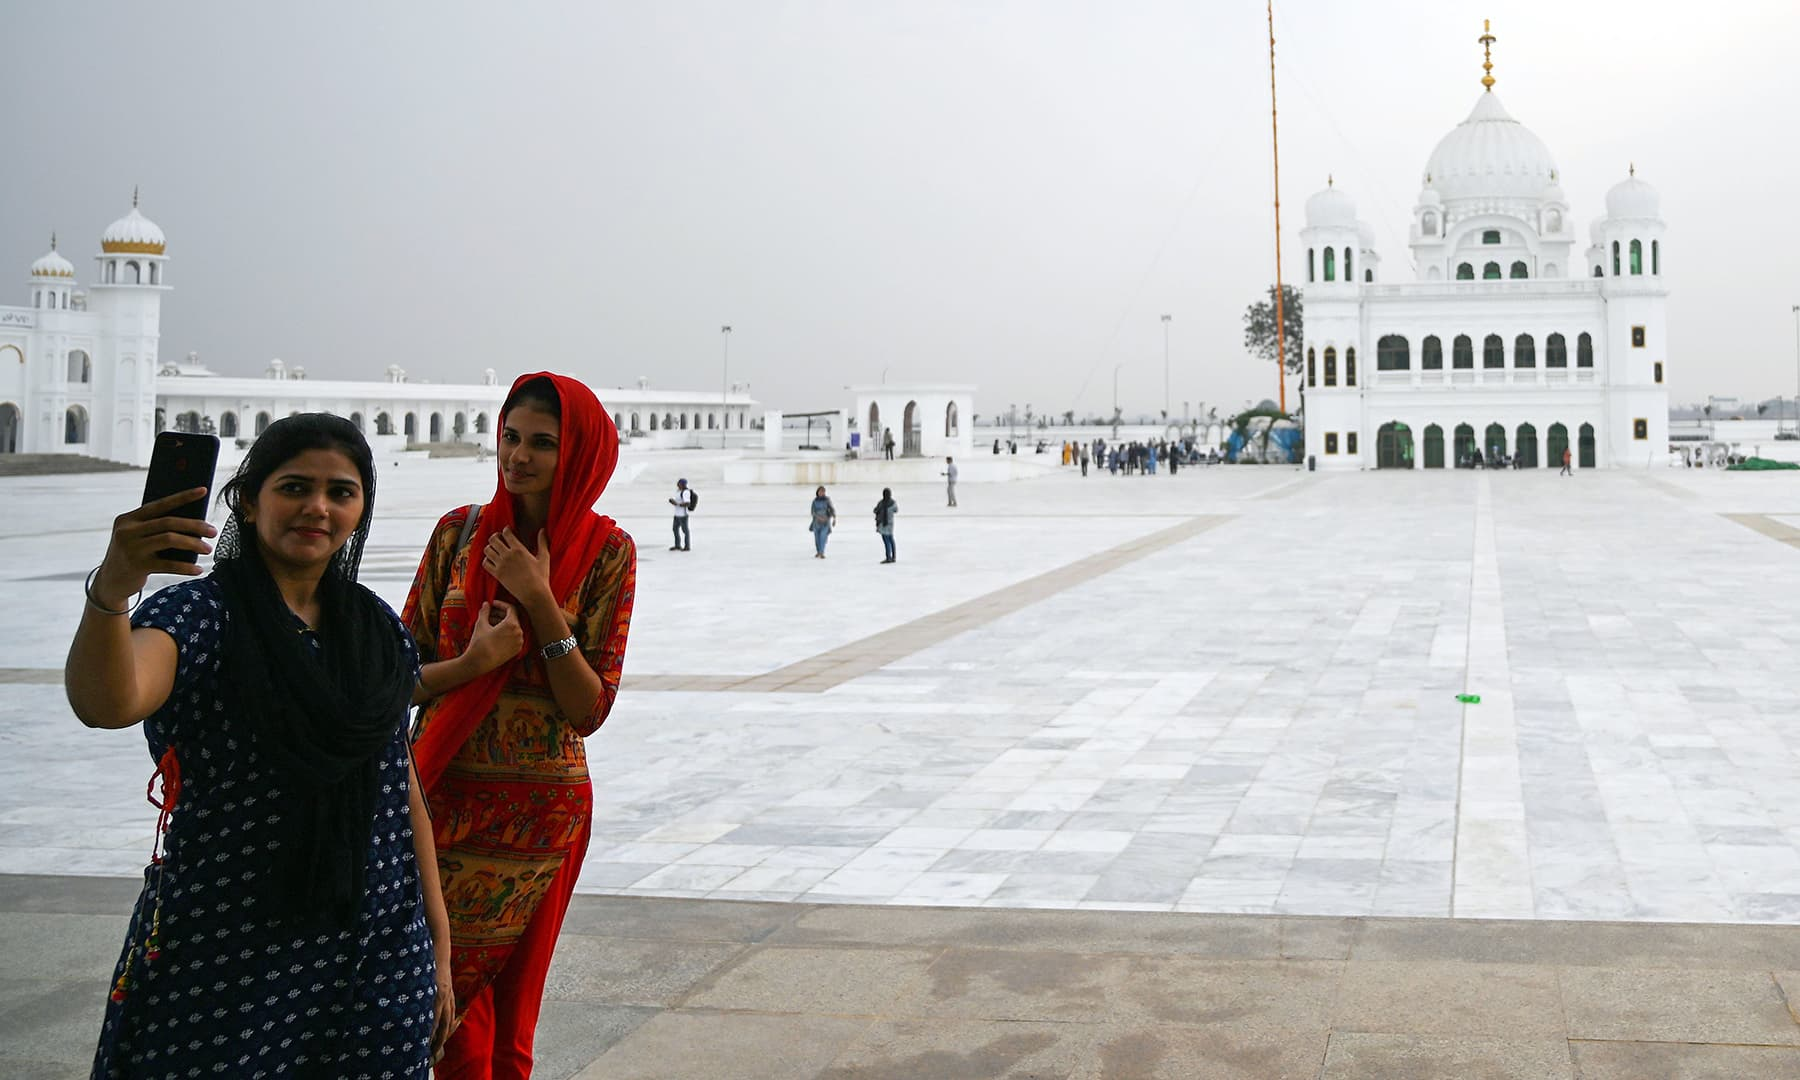 In this picture taken on November 6, Sikh pilgrims take selfies in front of the Shrine of Baba Guru Nanak Dev at the Gurdwara Darbar Sahib ahead of its opening, in Kartarpur. — AFP